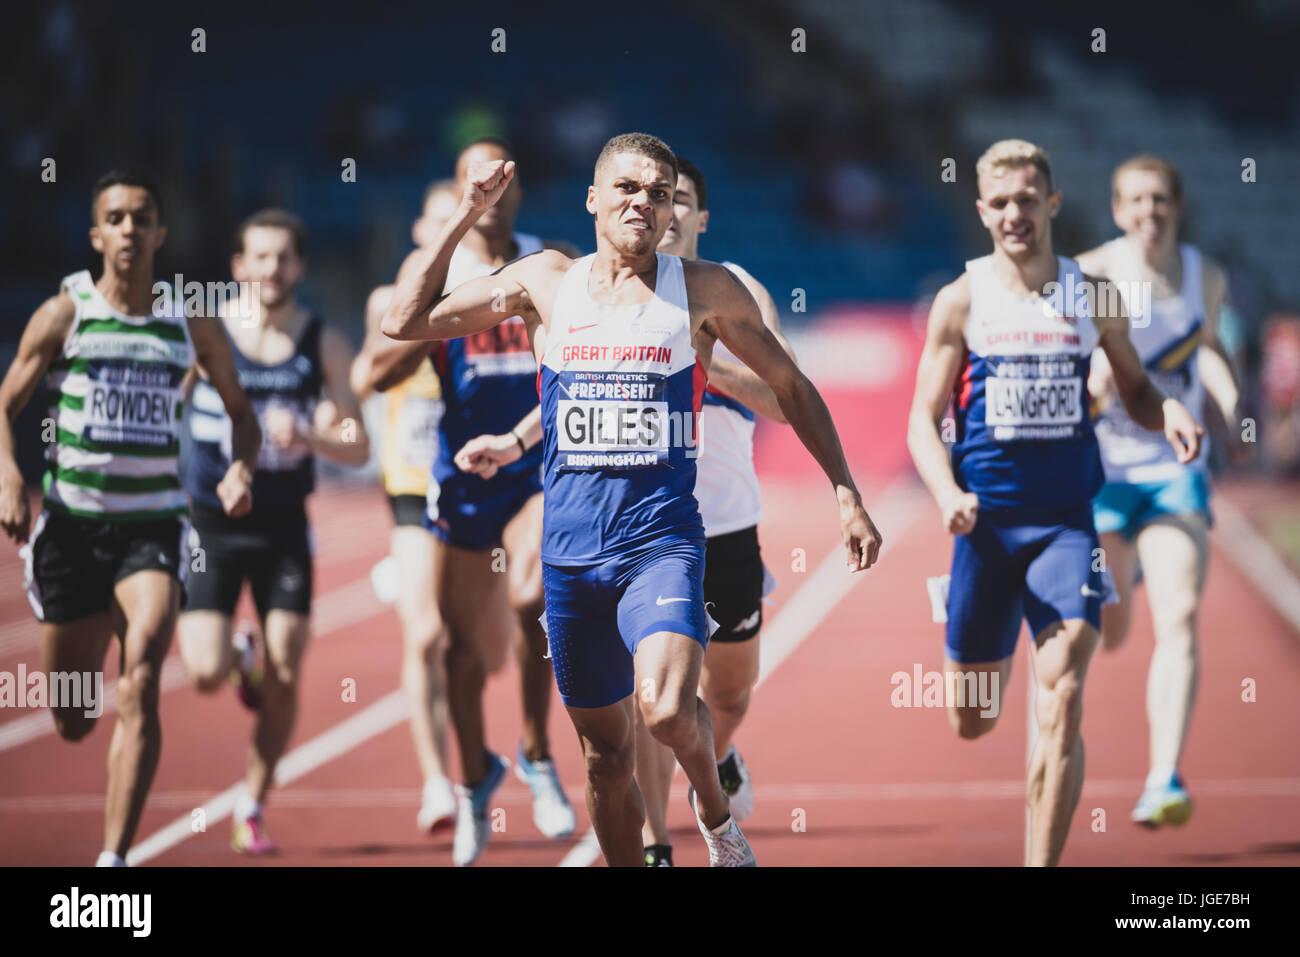 Elliot Giles wins the 1500m at the British Athletics Championships and World Trials at Birmingham, United Kingdom - Stock Image